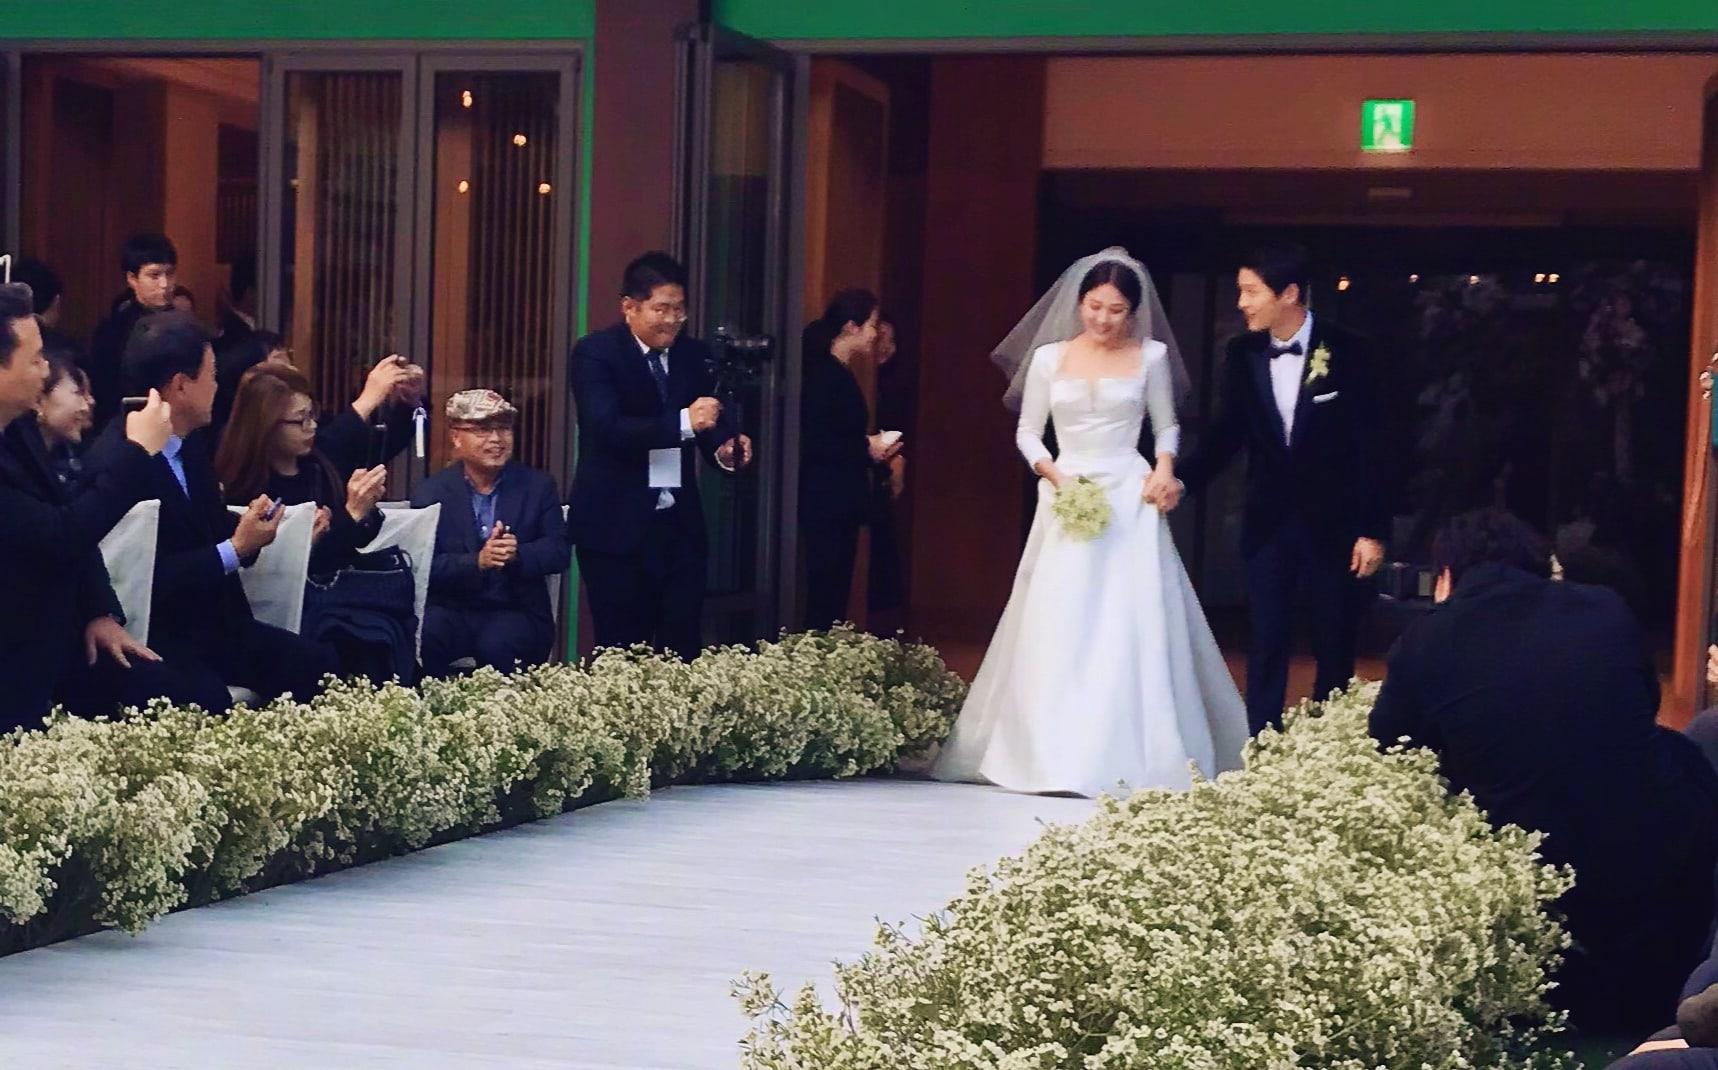 Fans Congratulate Song-Song Couple With #SongSongCoupleWedding Trending Worldwide